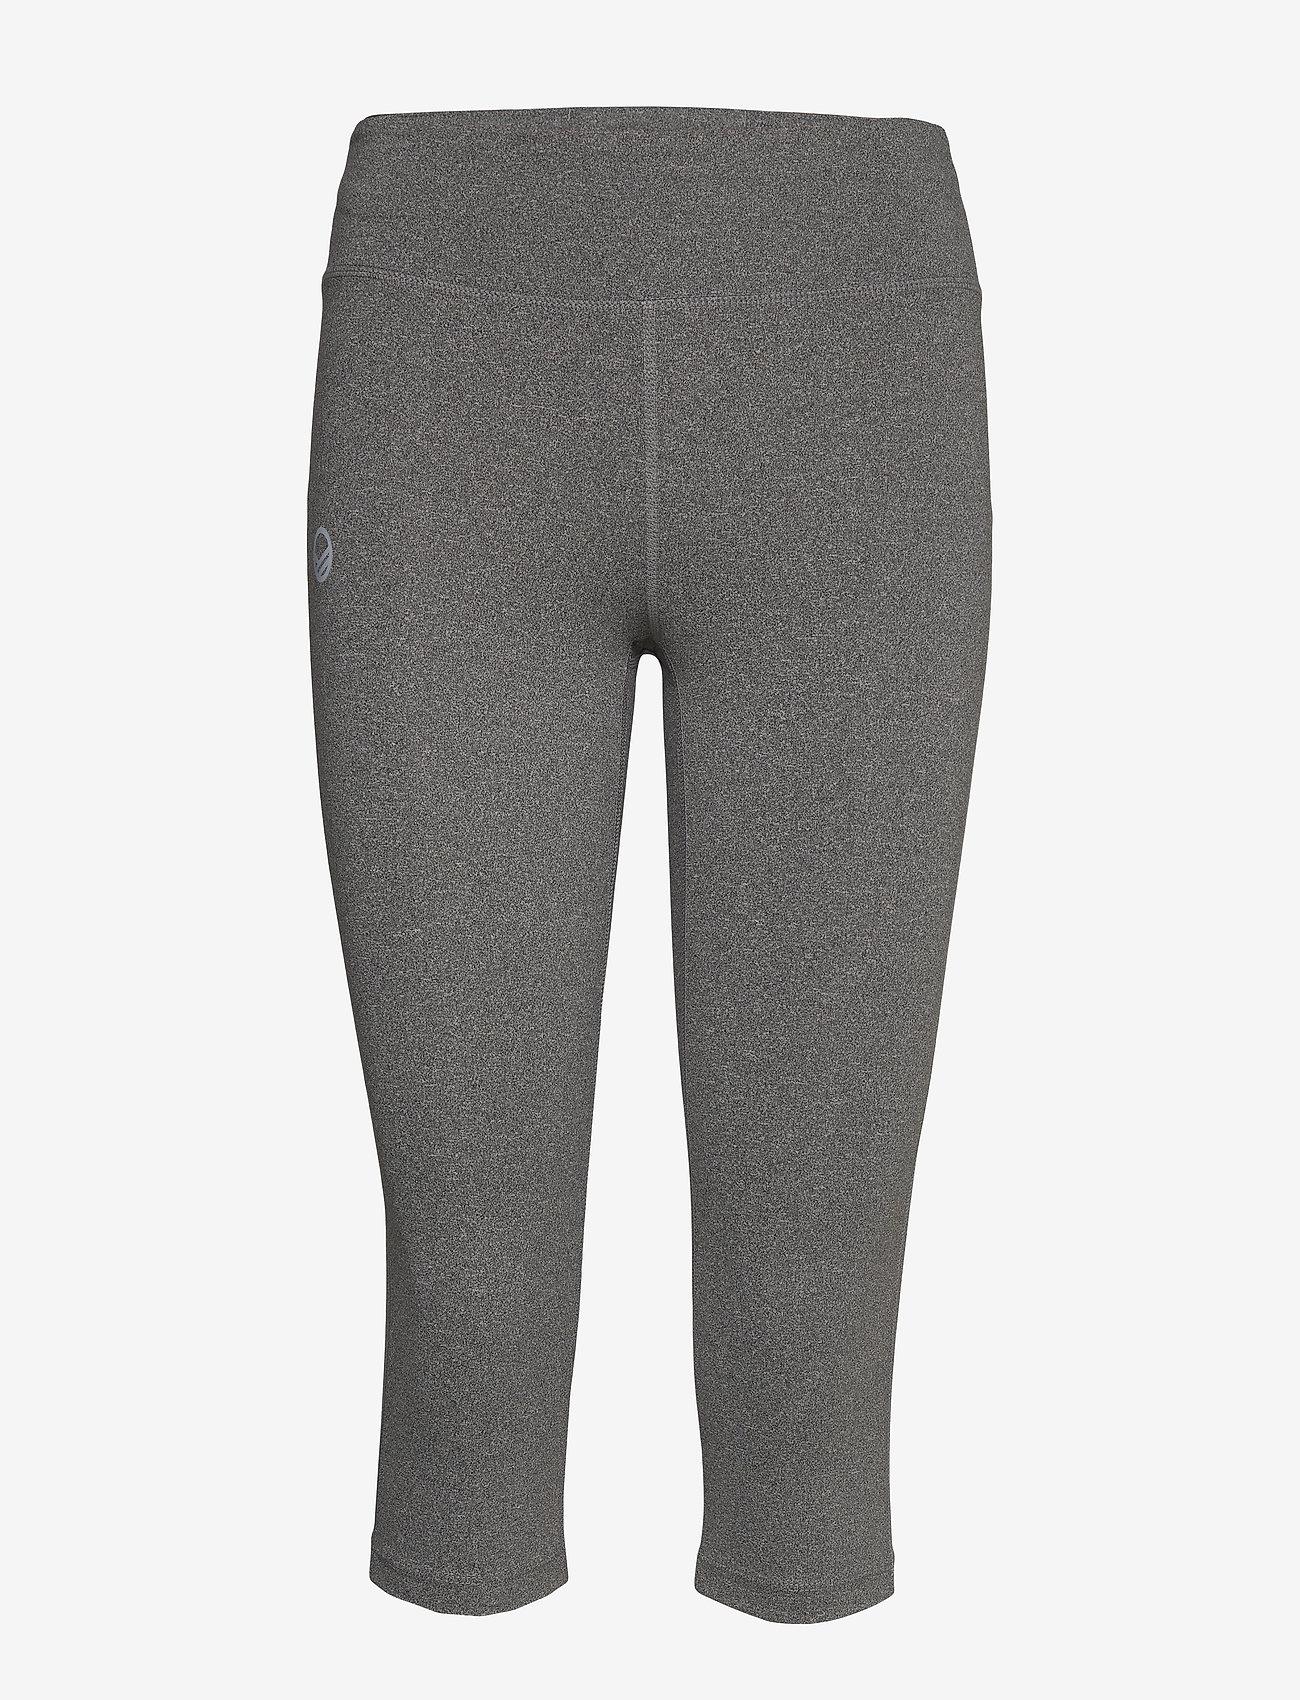 Halti Kauno Women's Capri Tights - Leggings & Granite Grey Melange